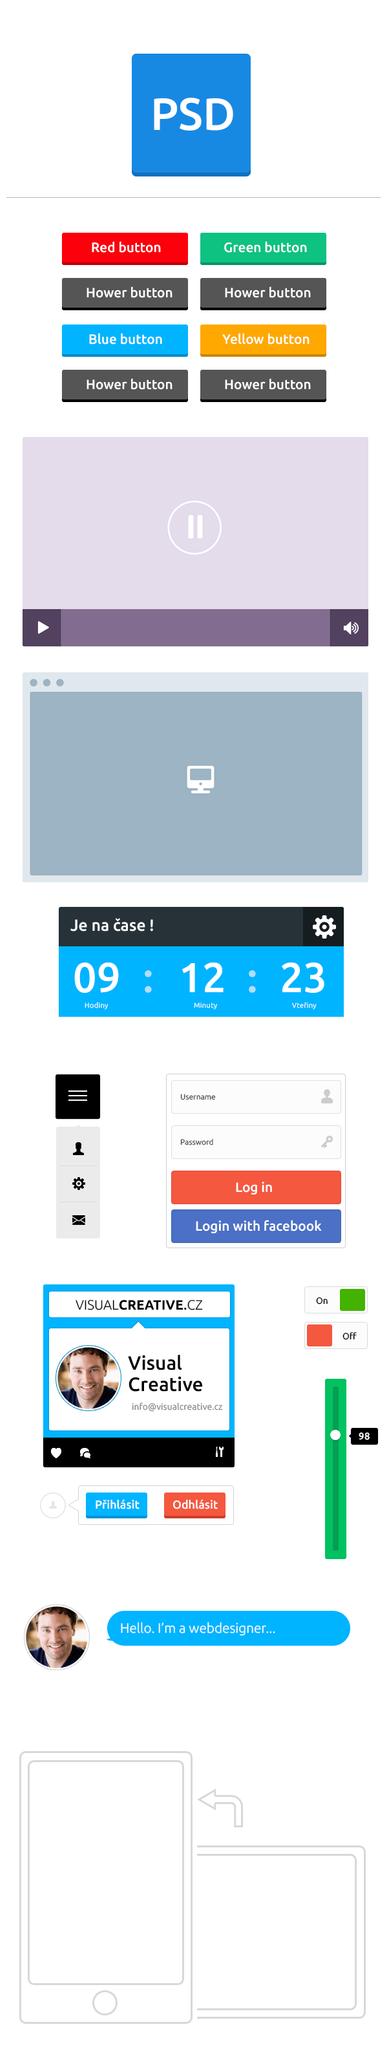 Free flat UI kit by Visual-Creative